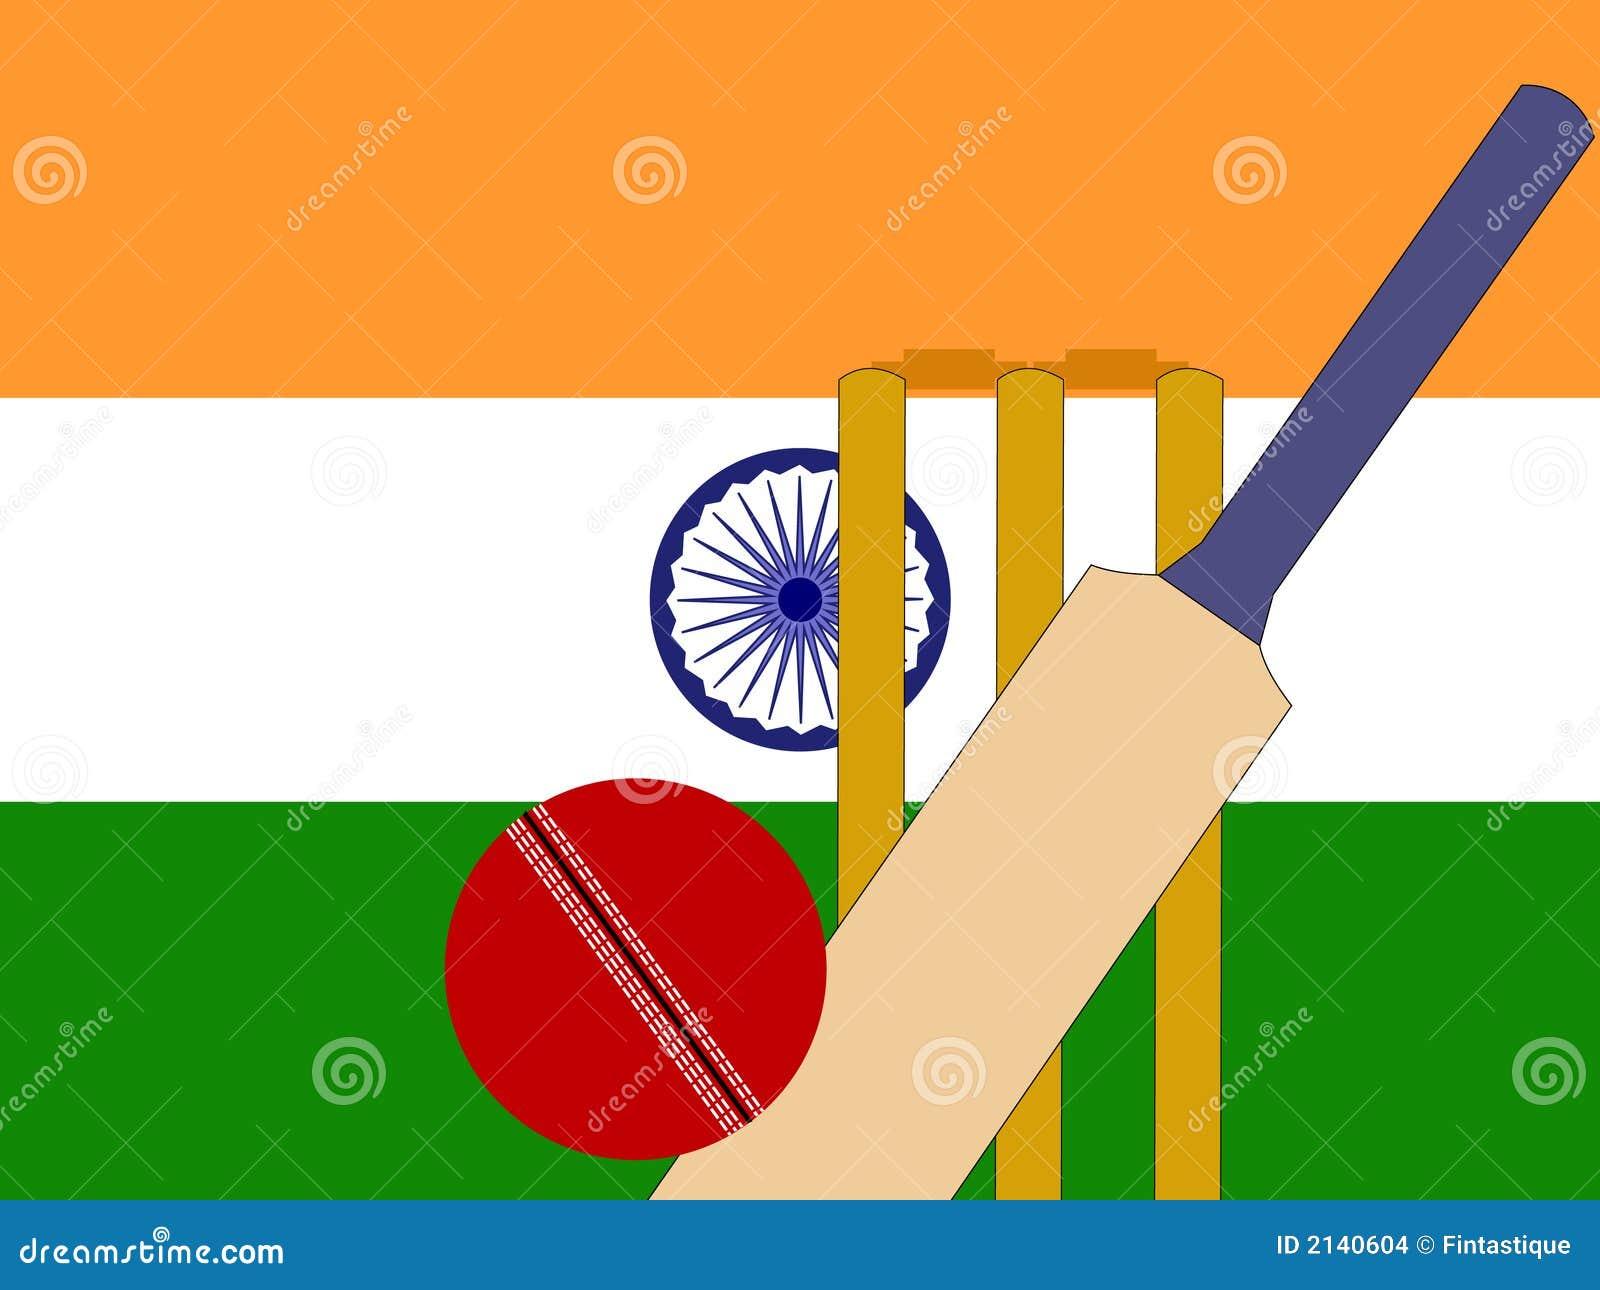 indian match making in australia Australia matrimony - australia matrimonial profiles for marriage, australia nri brides & grooms, australia marriage & shaadi, register australia boys & girls.